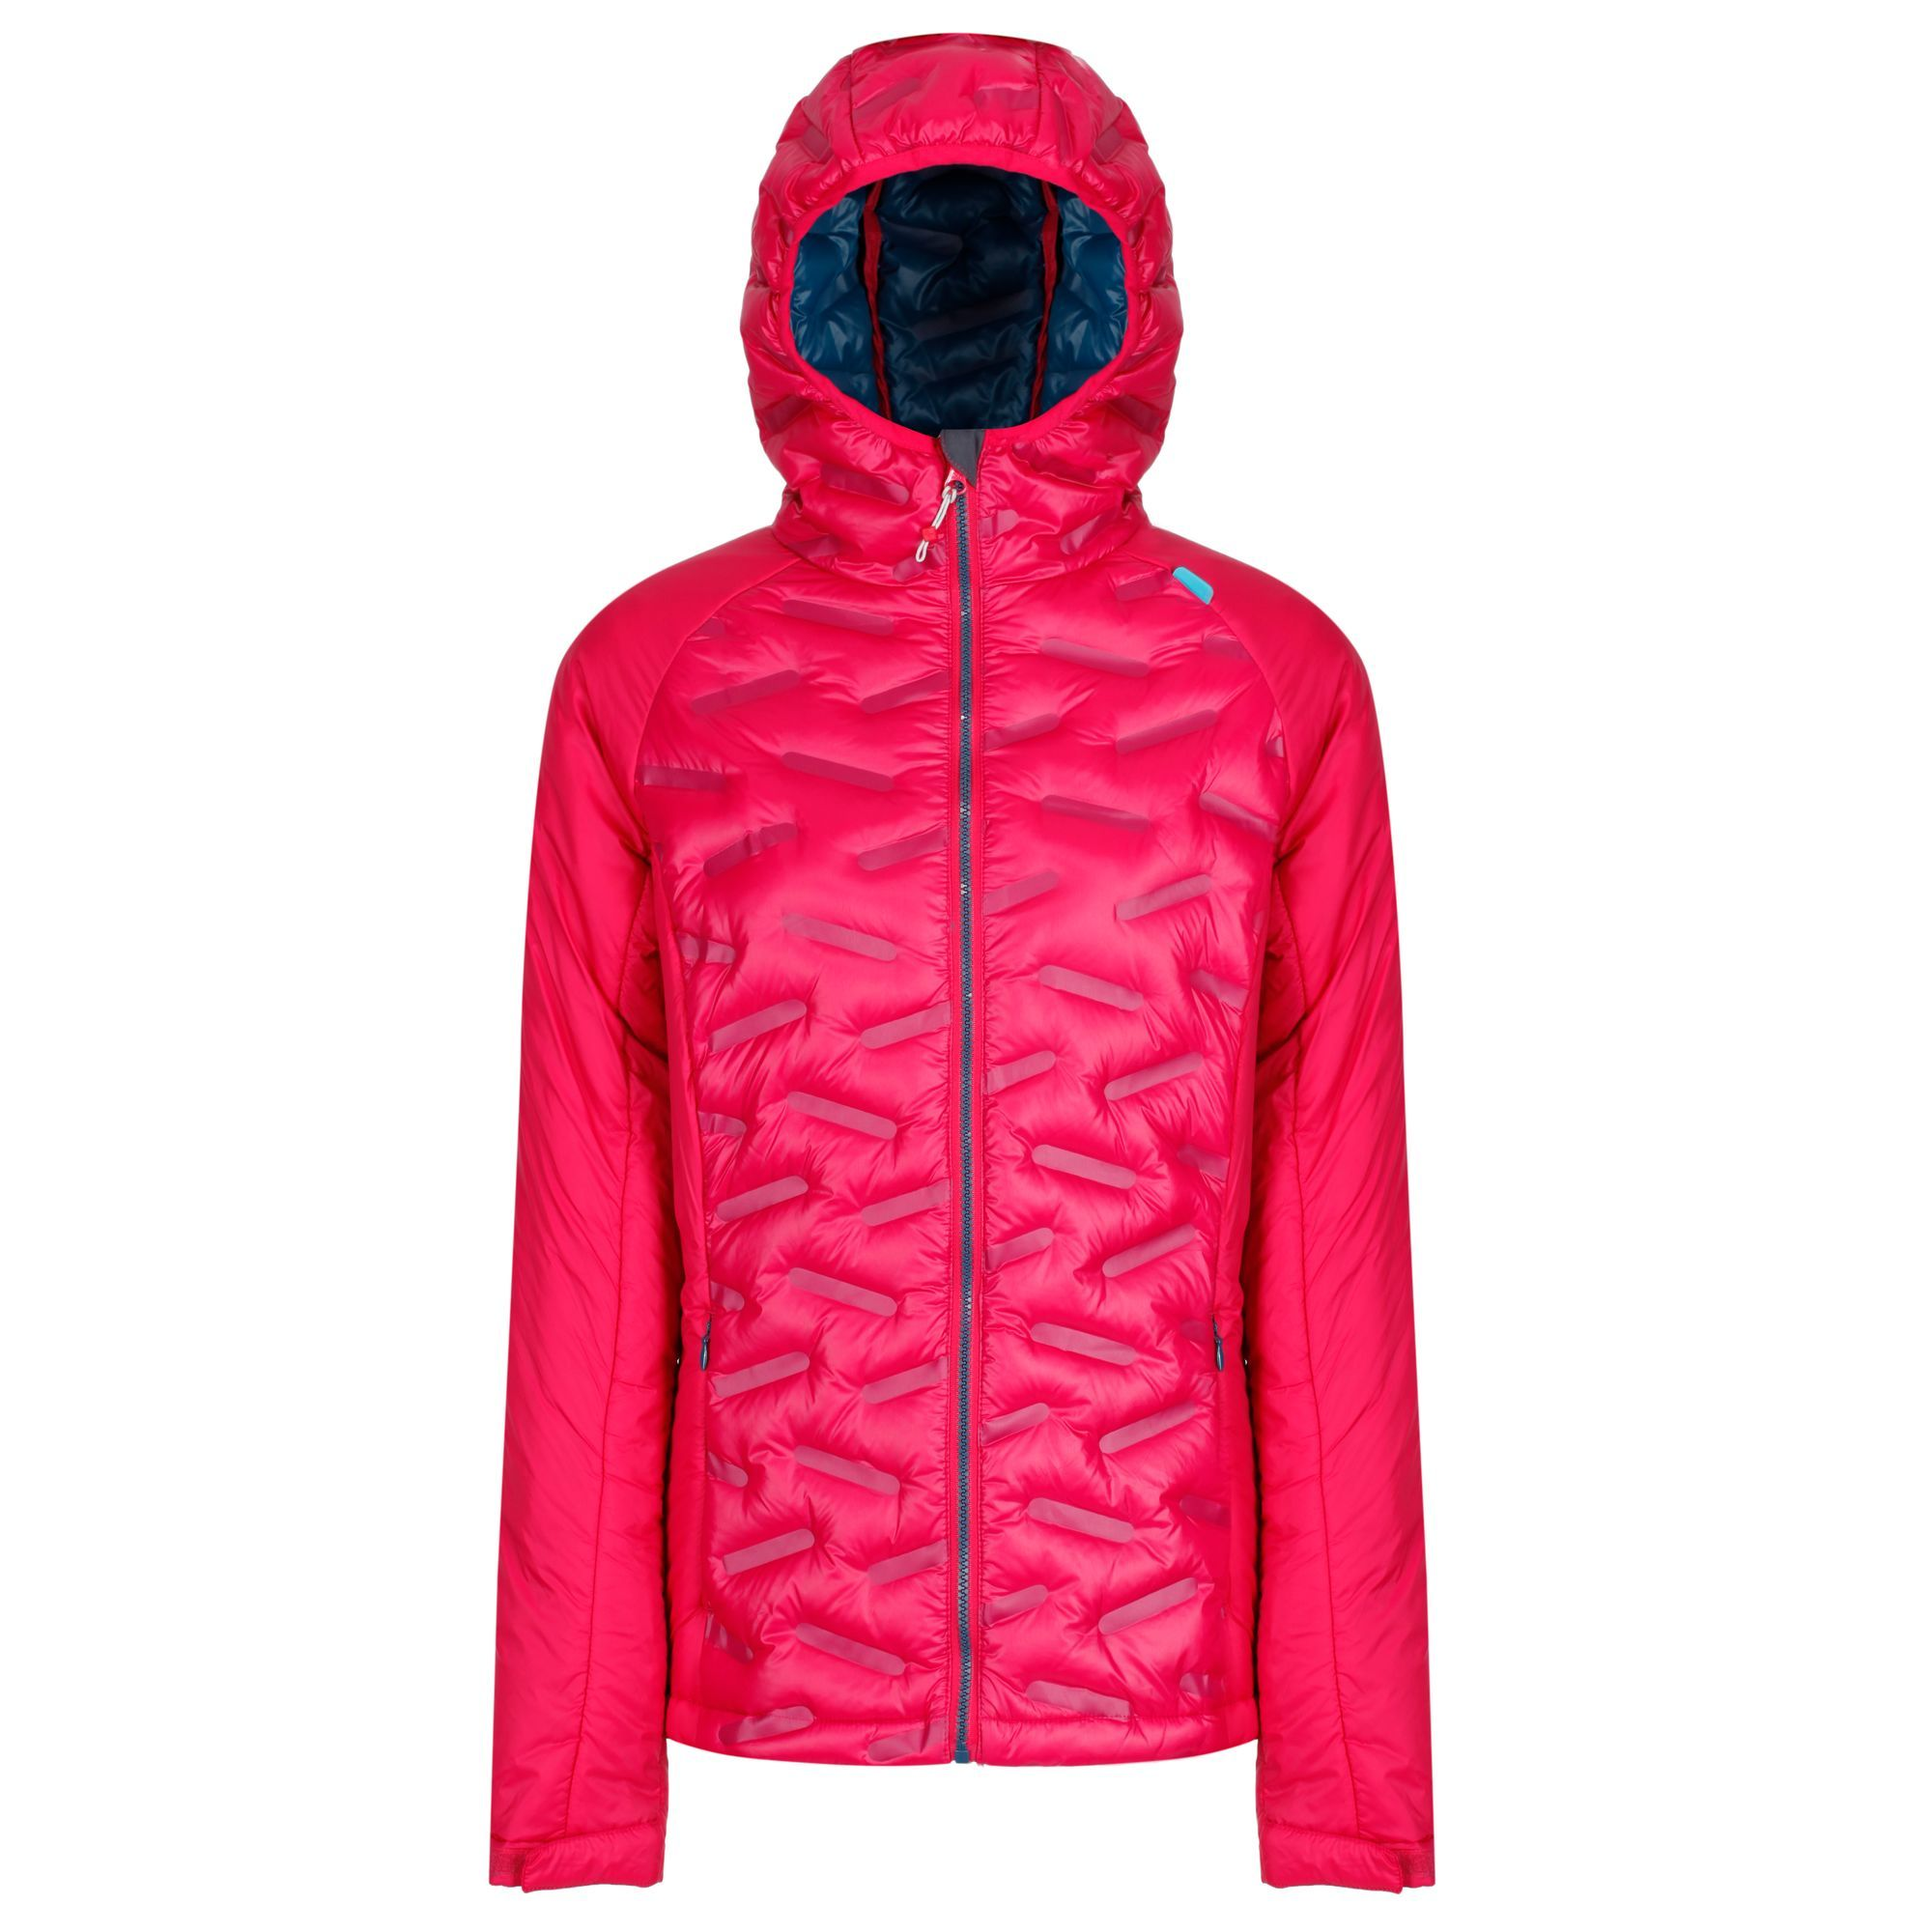 Regatta Great Outdoors Womens/Ladies Kartona Warmloft Downtouch Jacket